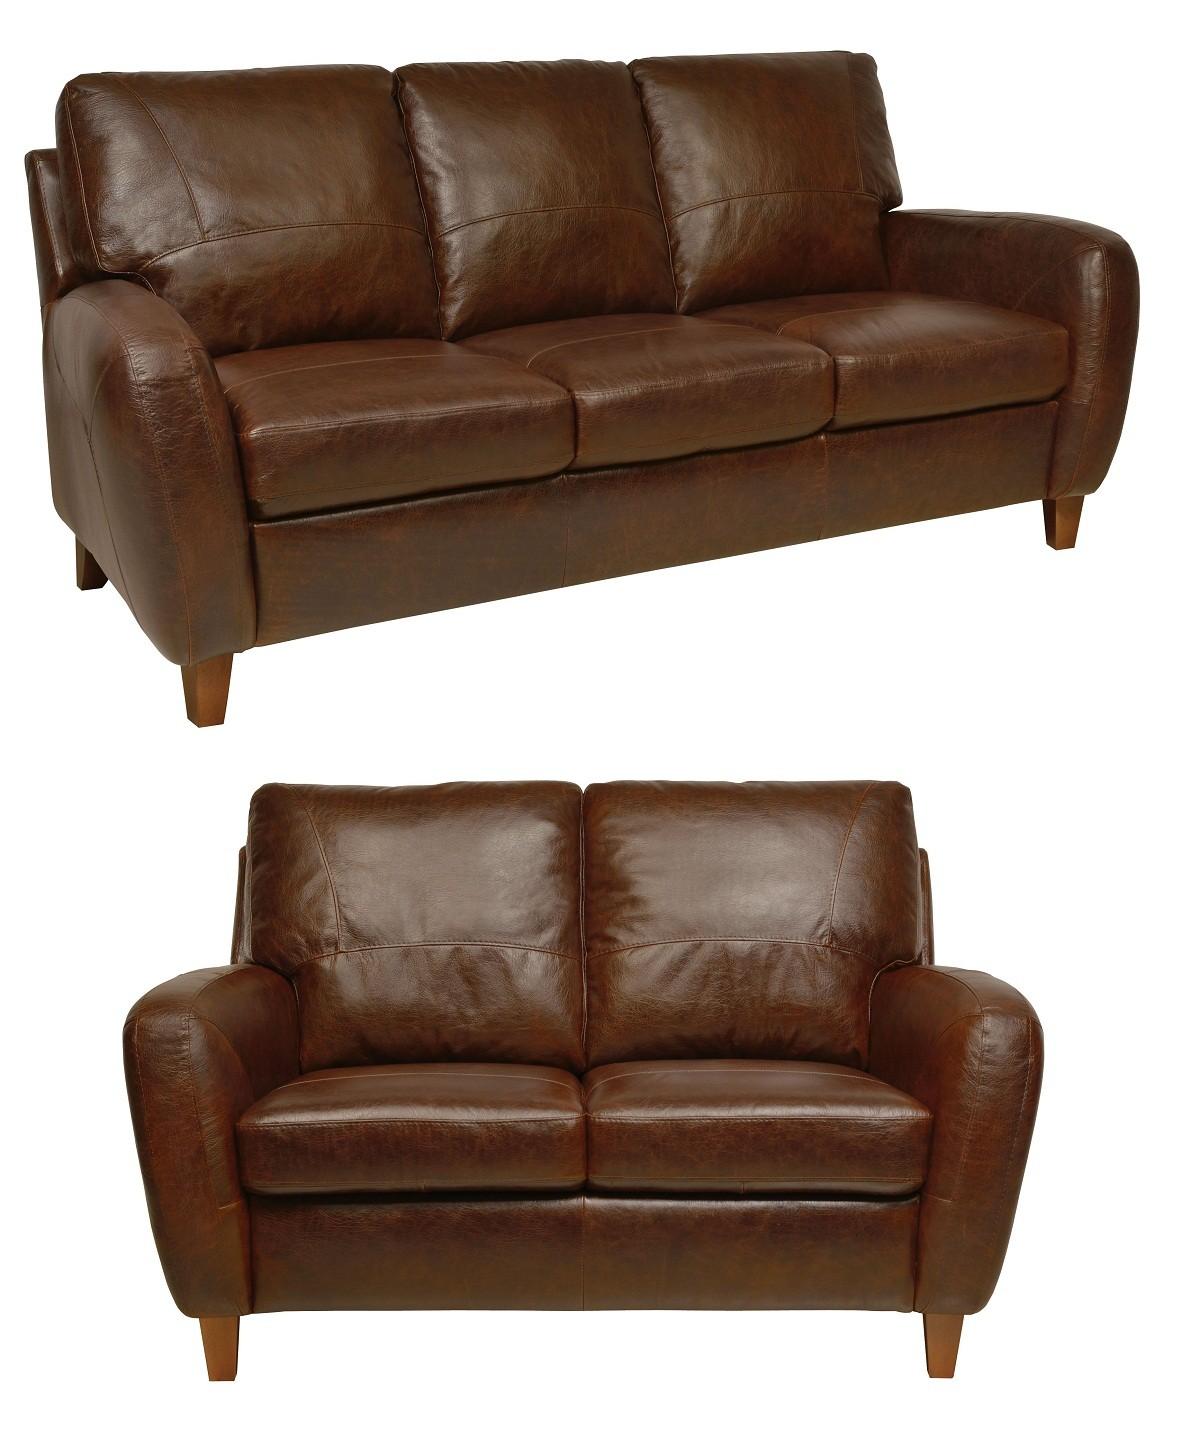 Living Room Furniture: Jennifer Antique Tan Italian Leather Living Room Set From